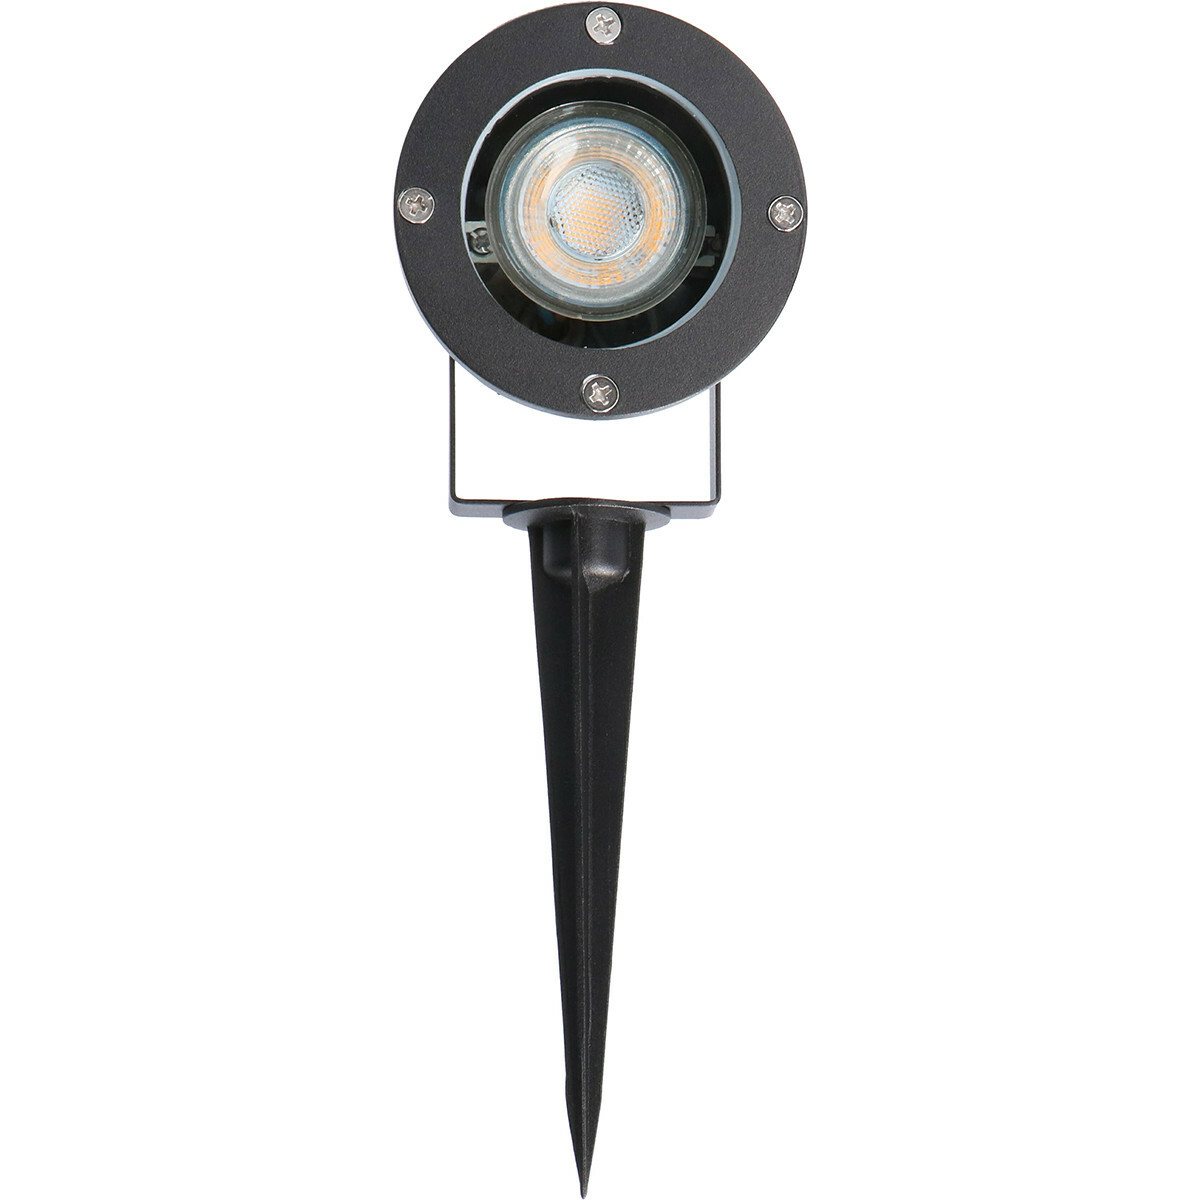 PHILIPS - Prikspot met Stekker - CorePro 840 36D - Sanola Urbun - GU10 Fitting - Dimbaar - 4W - Natu